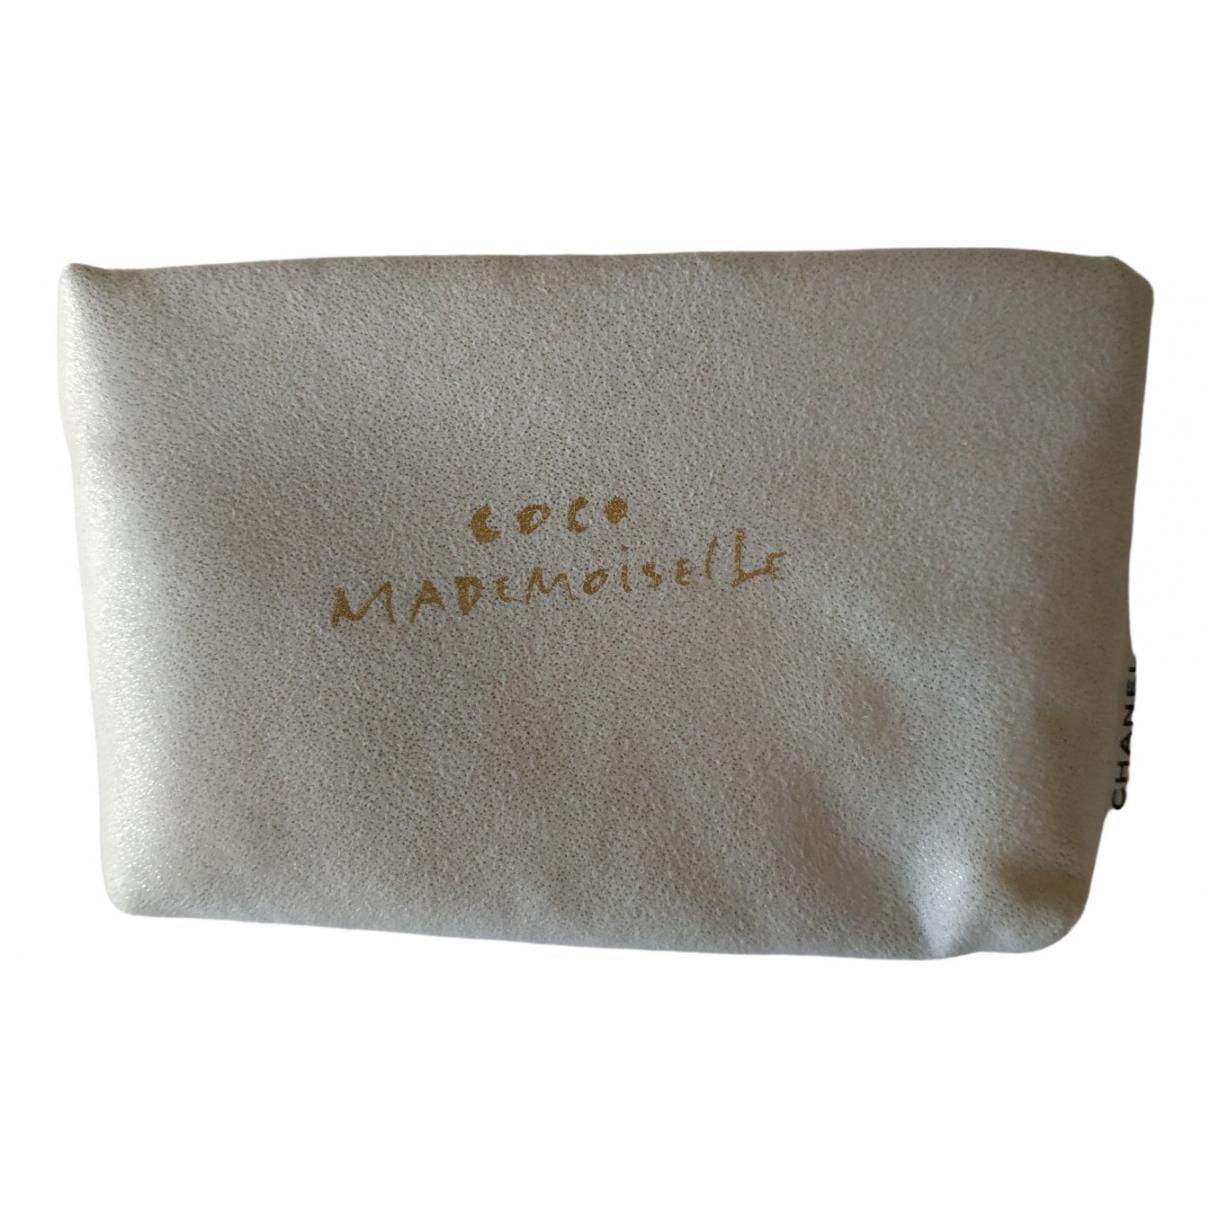 Chanel \N Beige Cloth Travel bag for Women \N